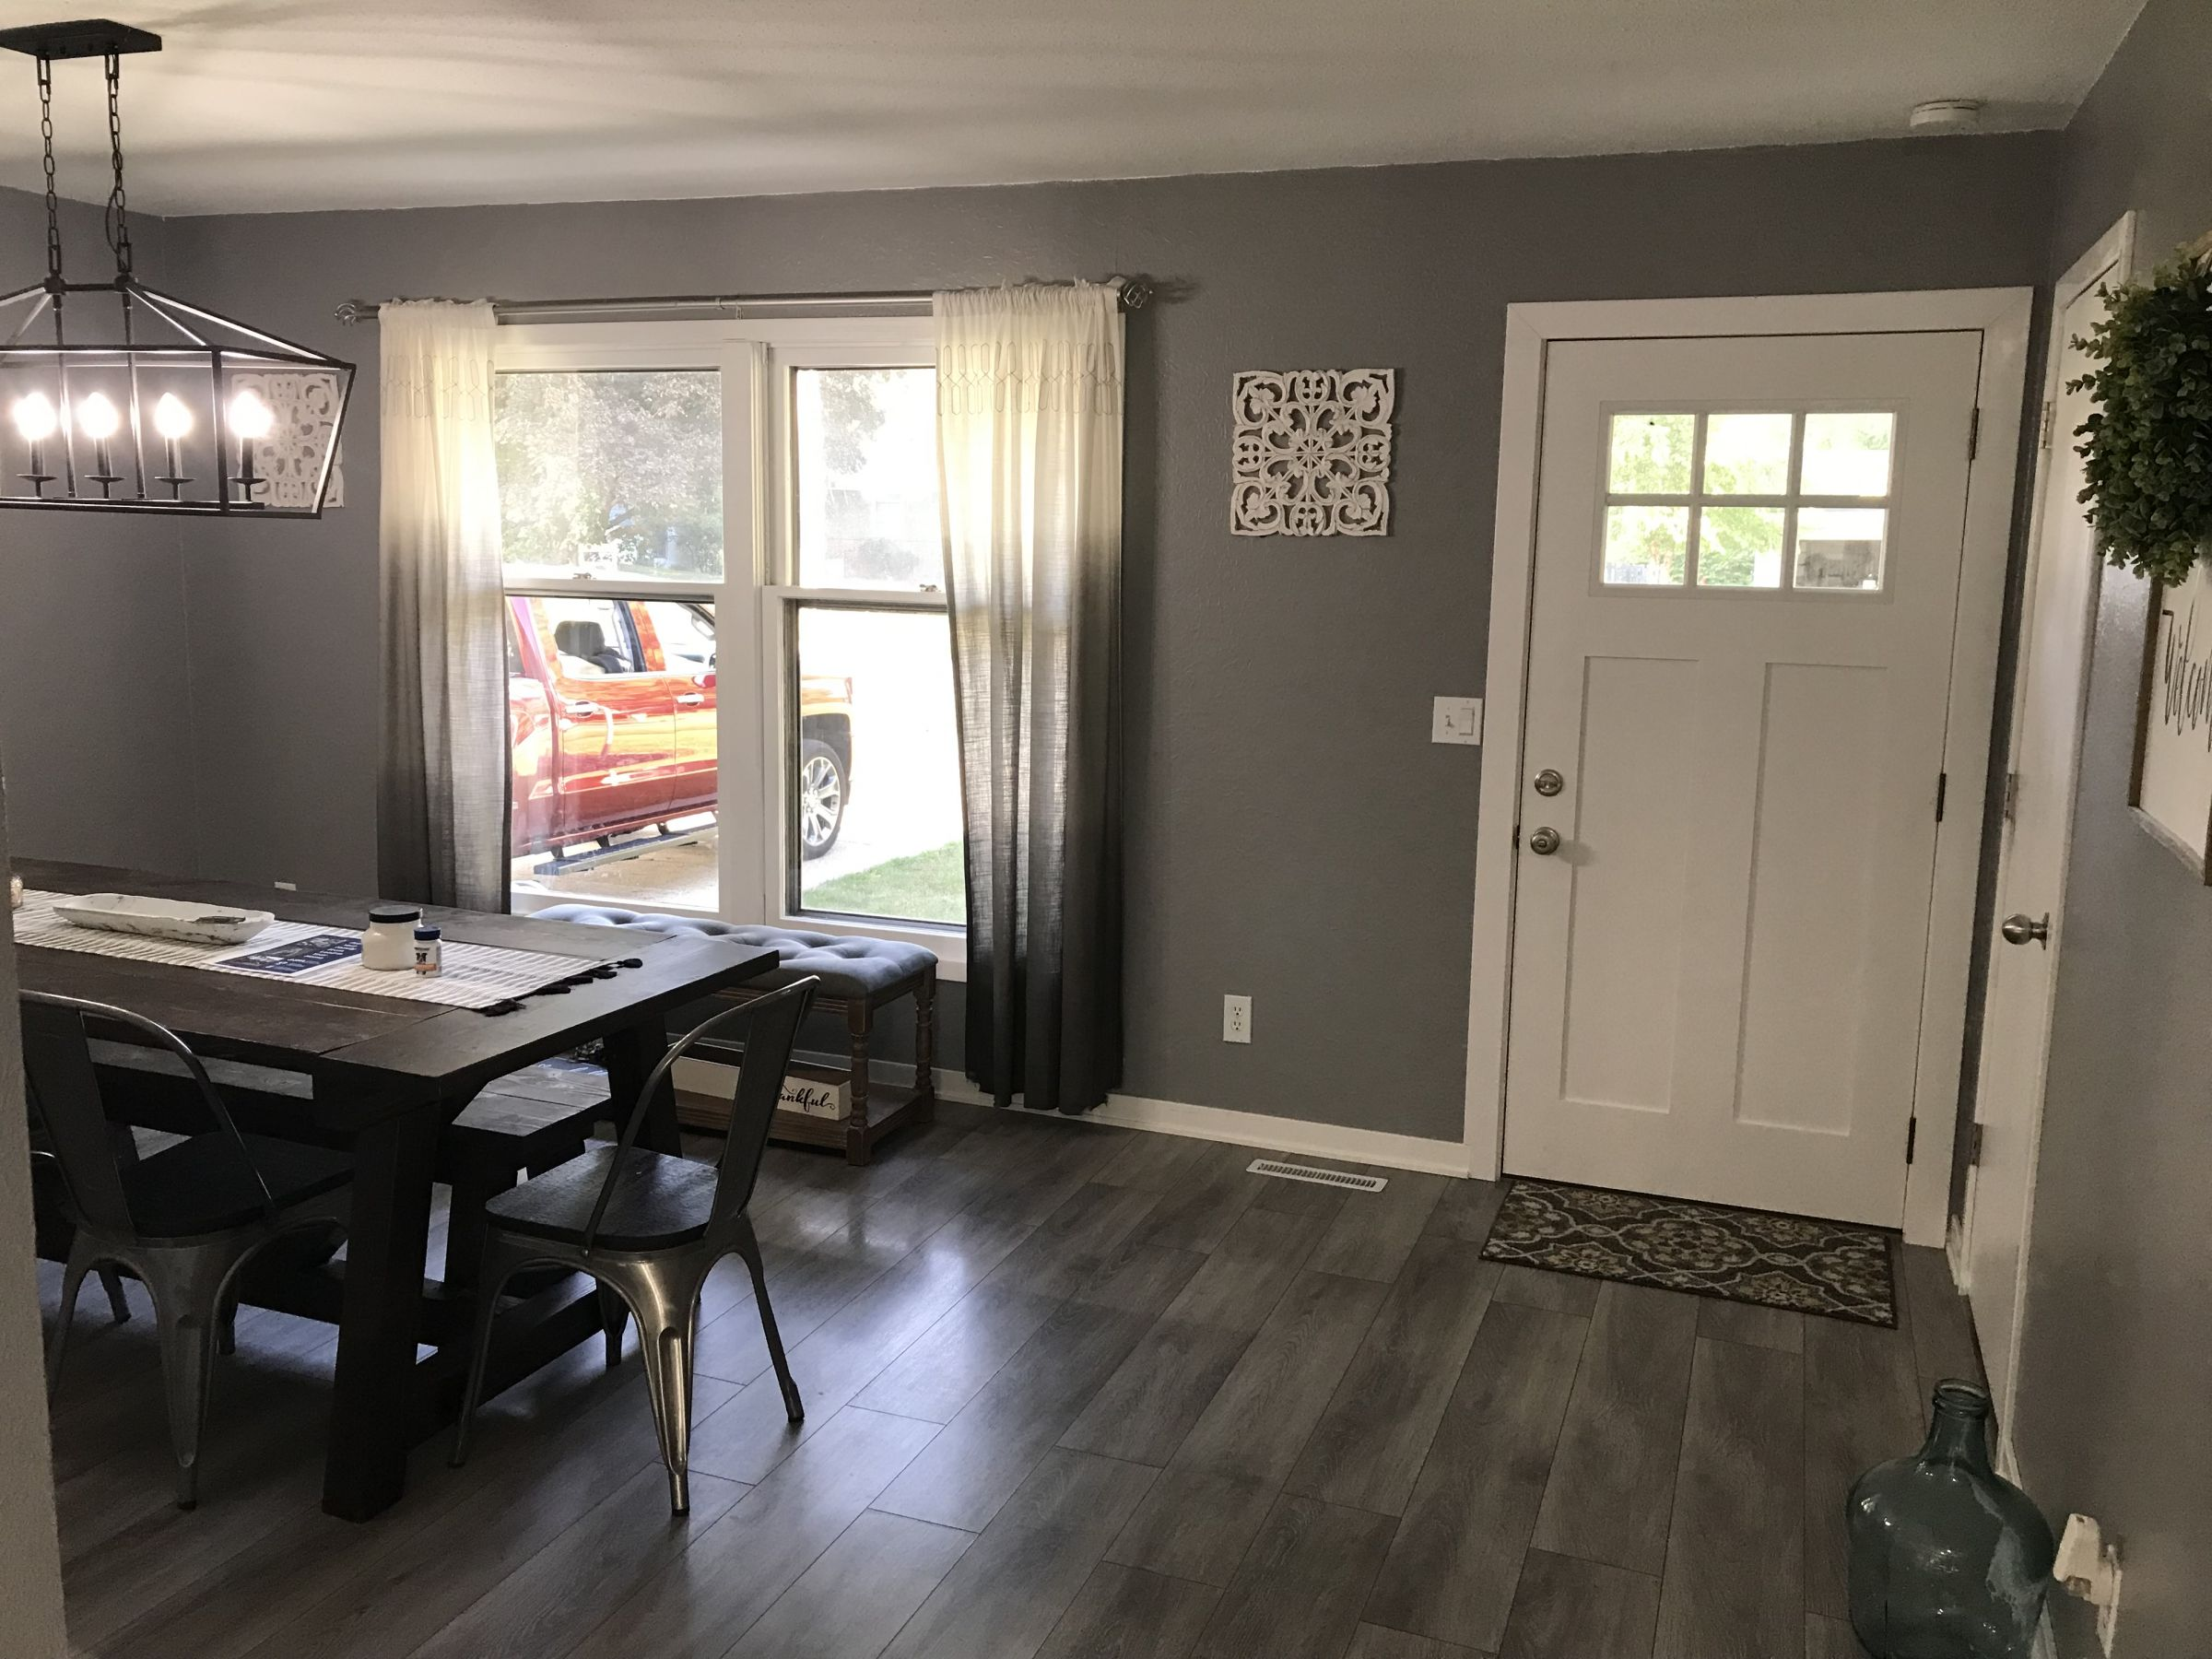 residential-warren-county-iowa-0-acres-listing-number-15778-9-2021-09-28-155346.JPG